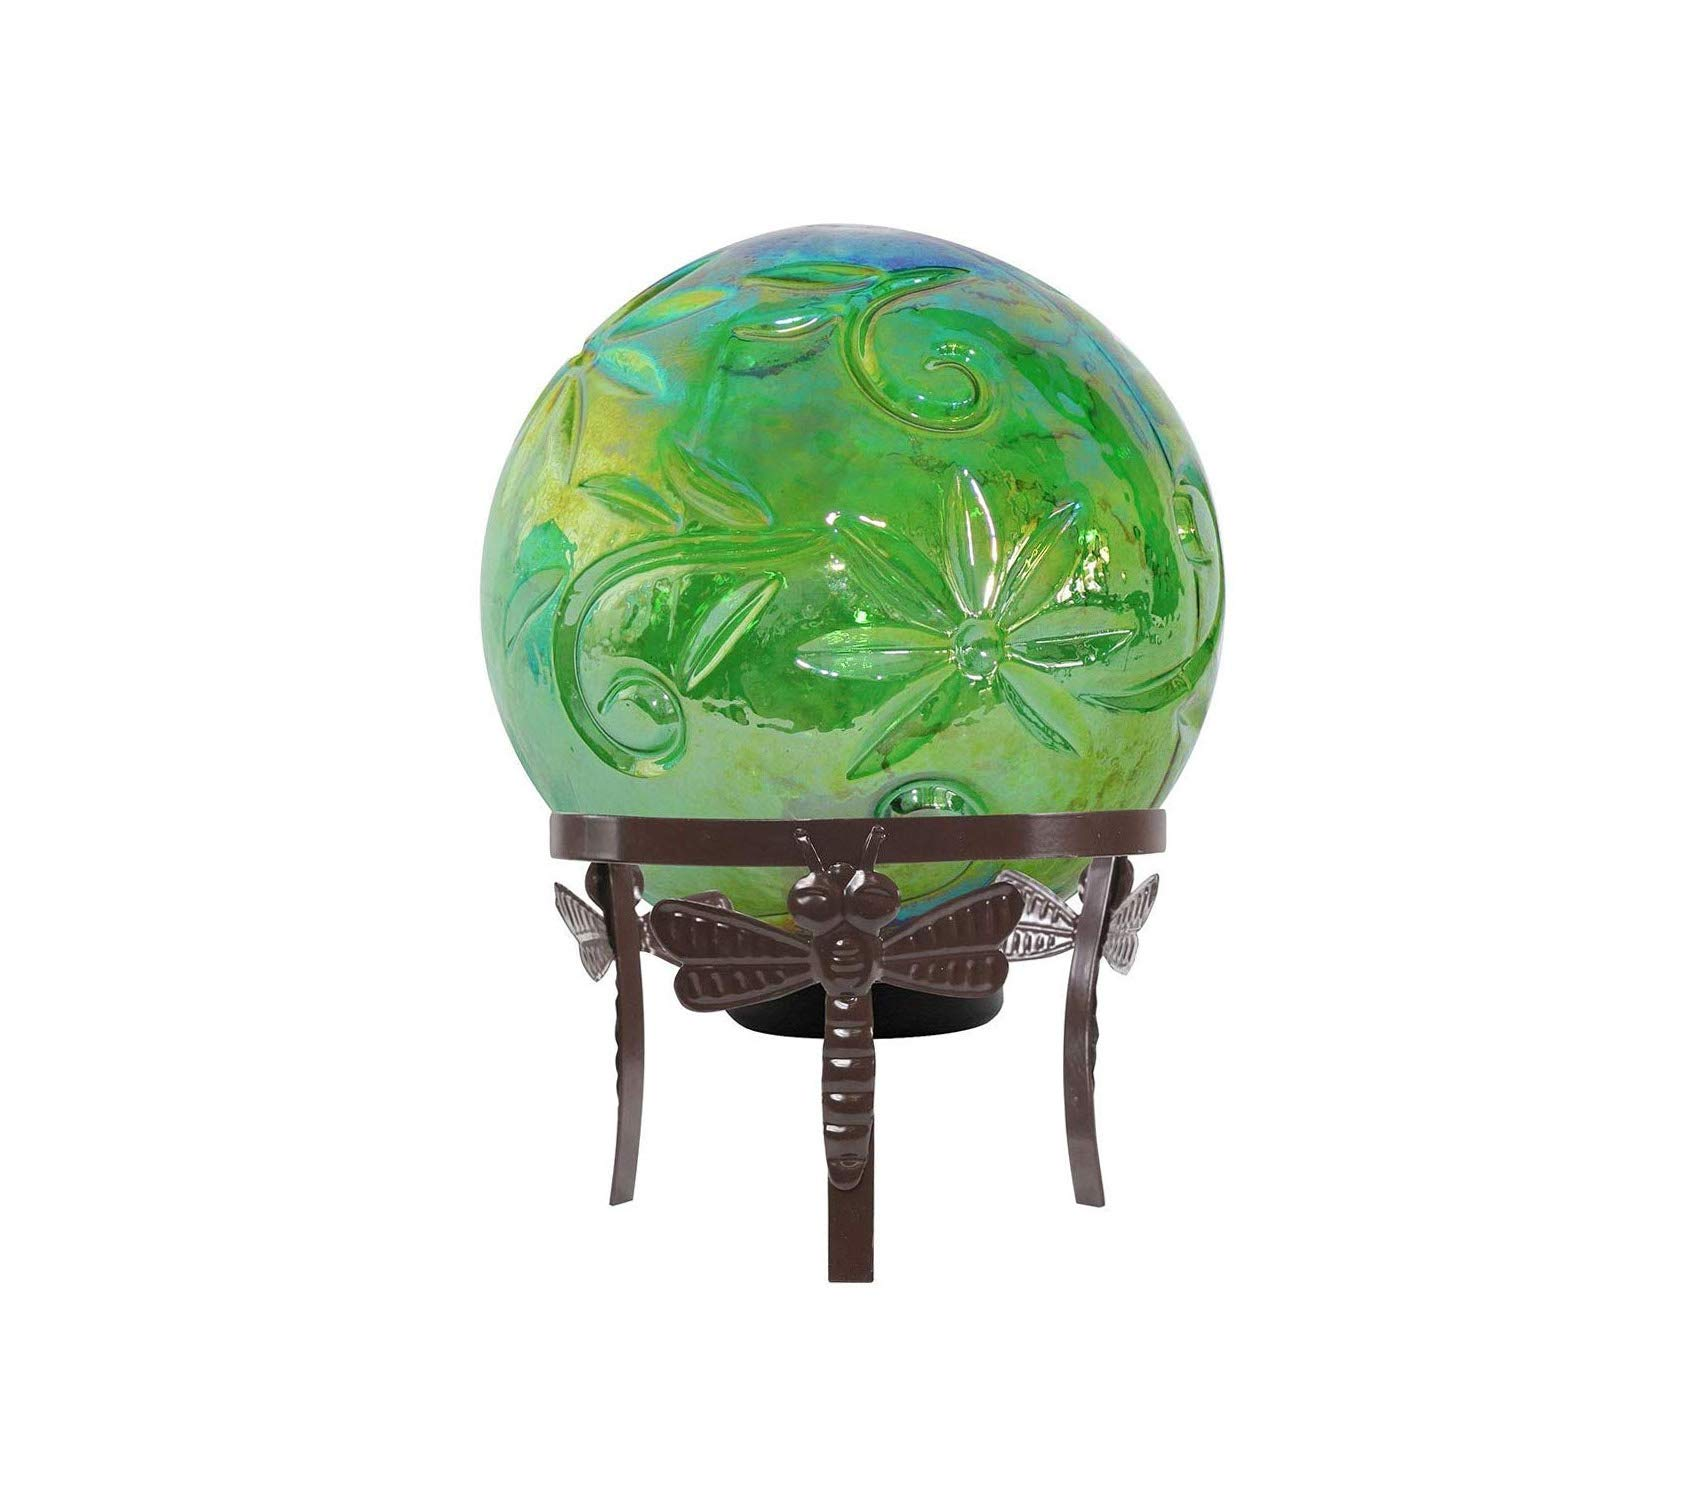 Outdoor Garden Backyard Décor Glass Globe Decor w/LED Light, 13 Inch Tall Green